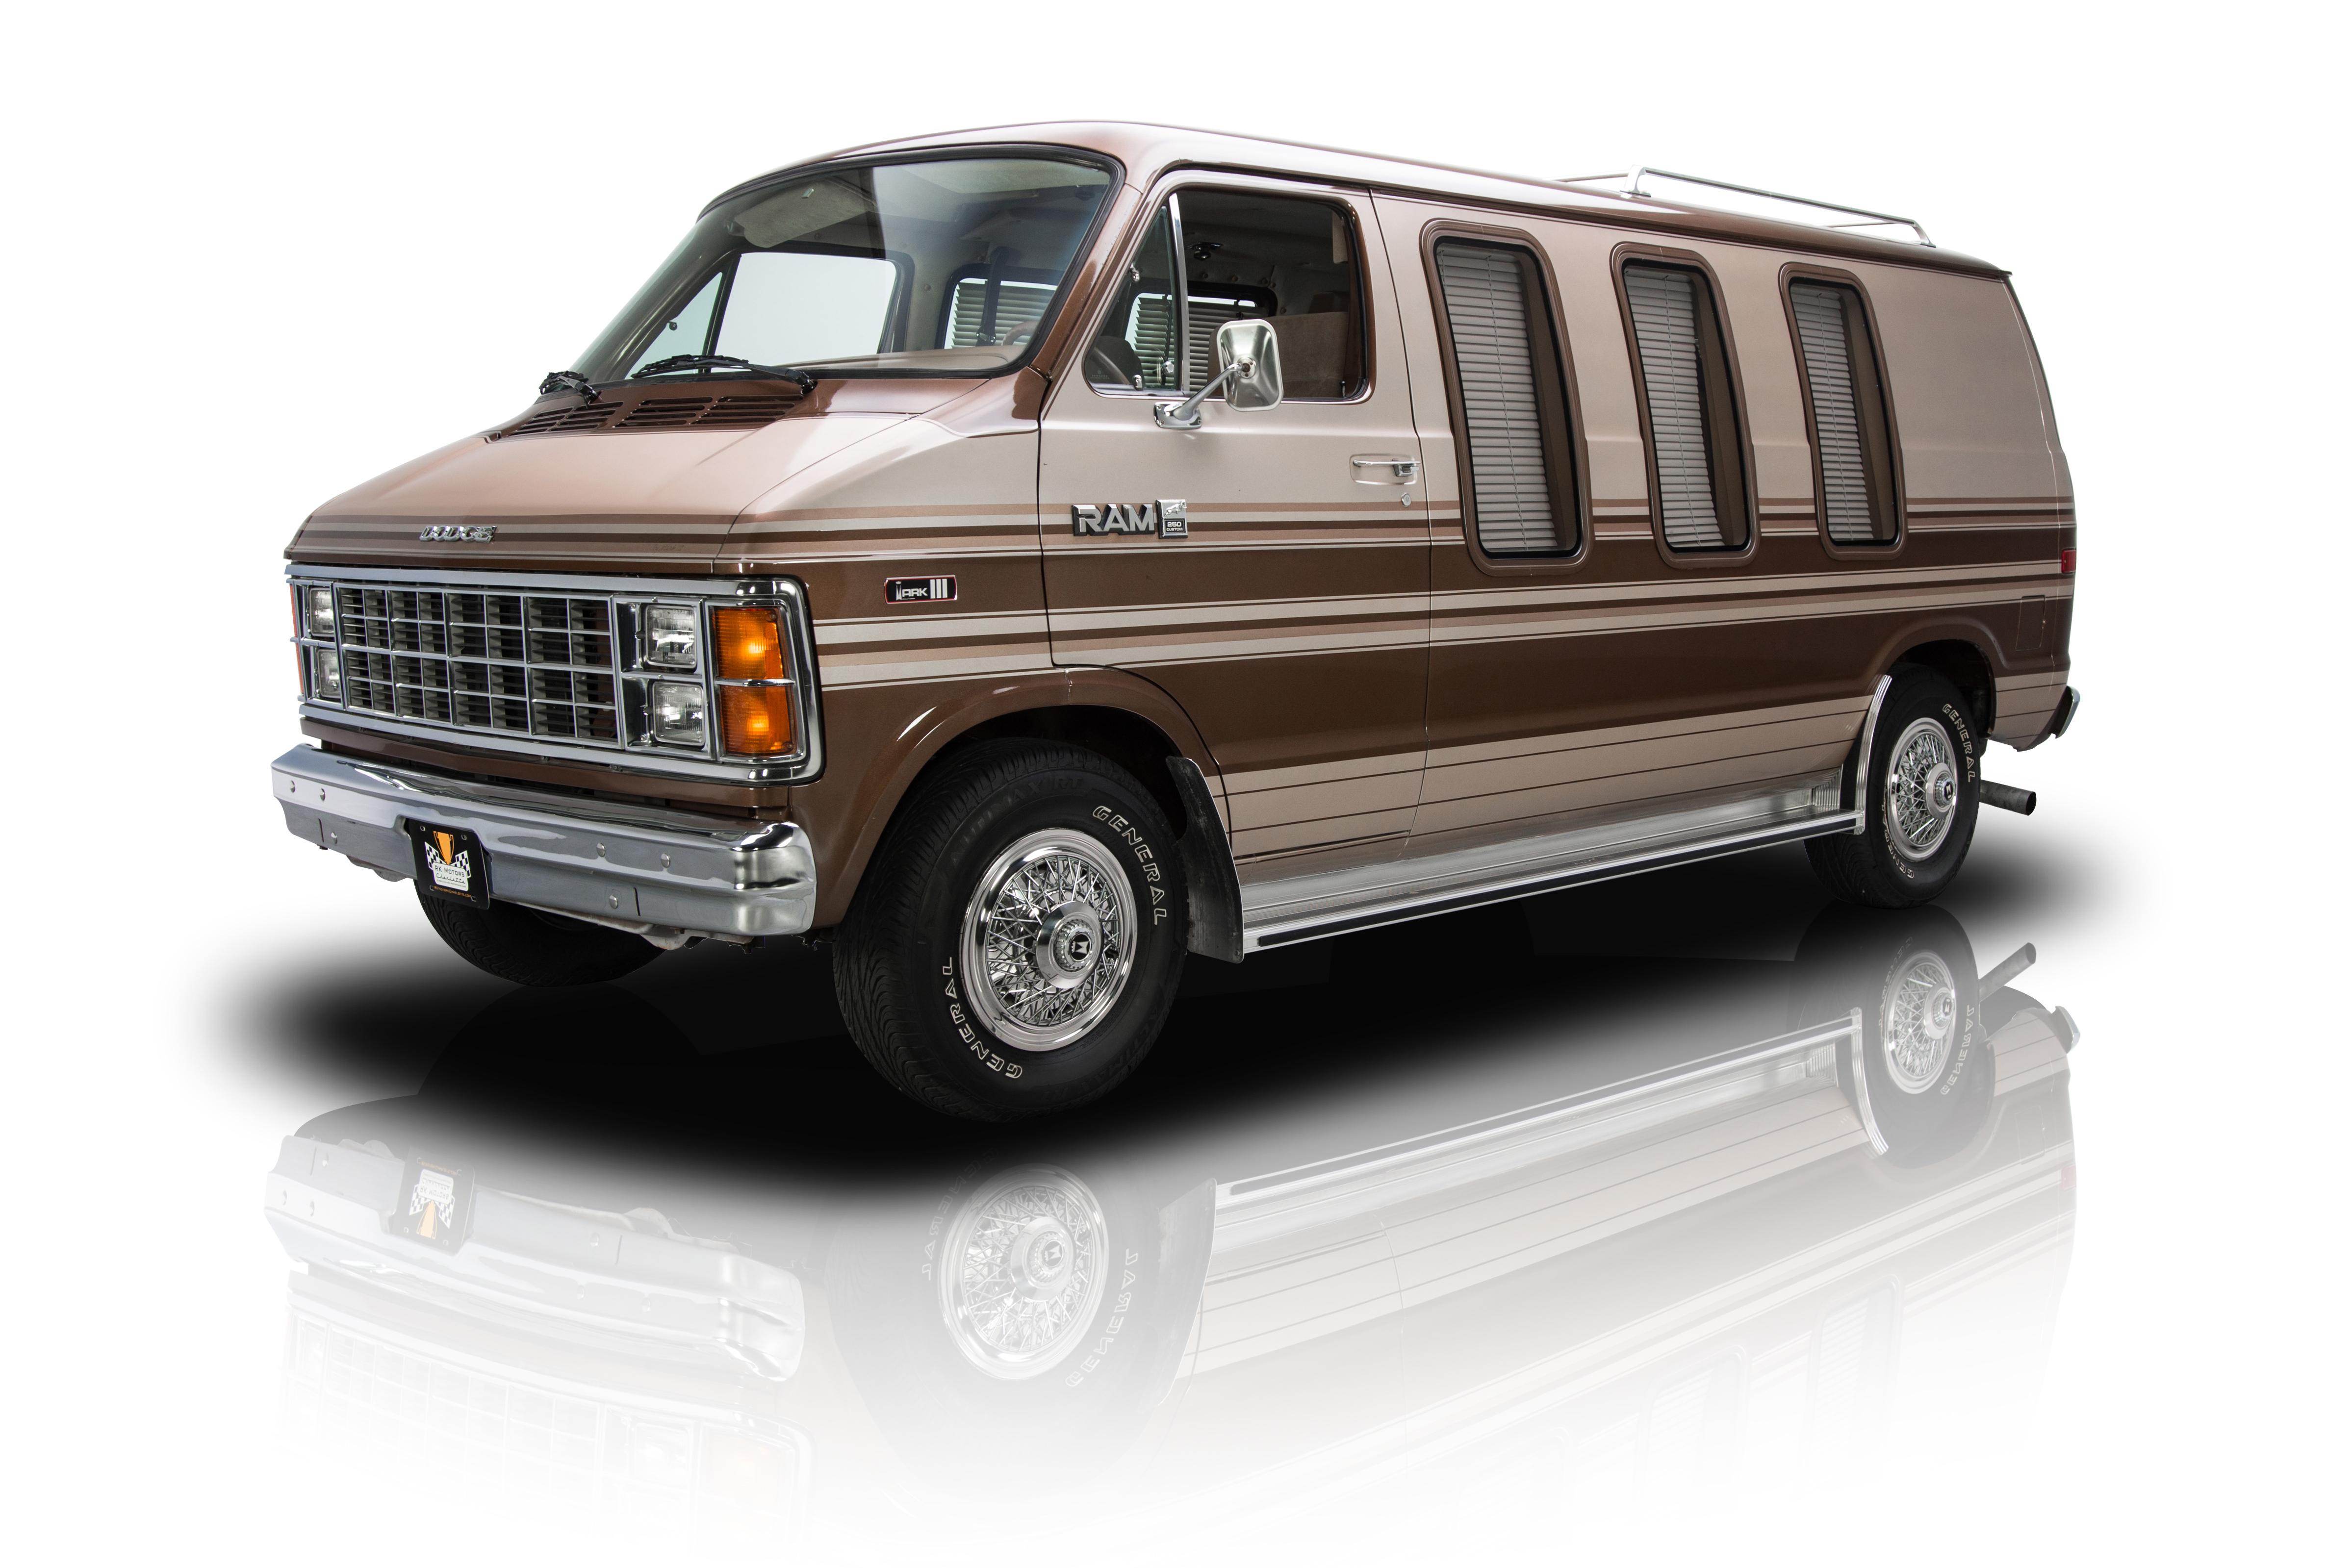 134940 1985 Dodge Ram Rk Motors